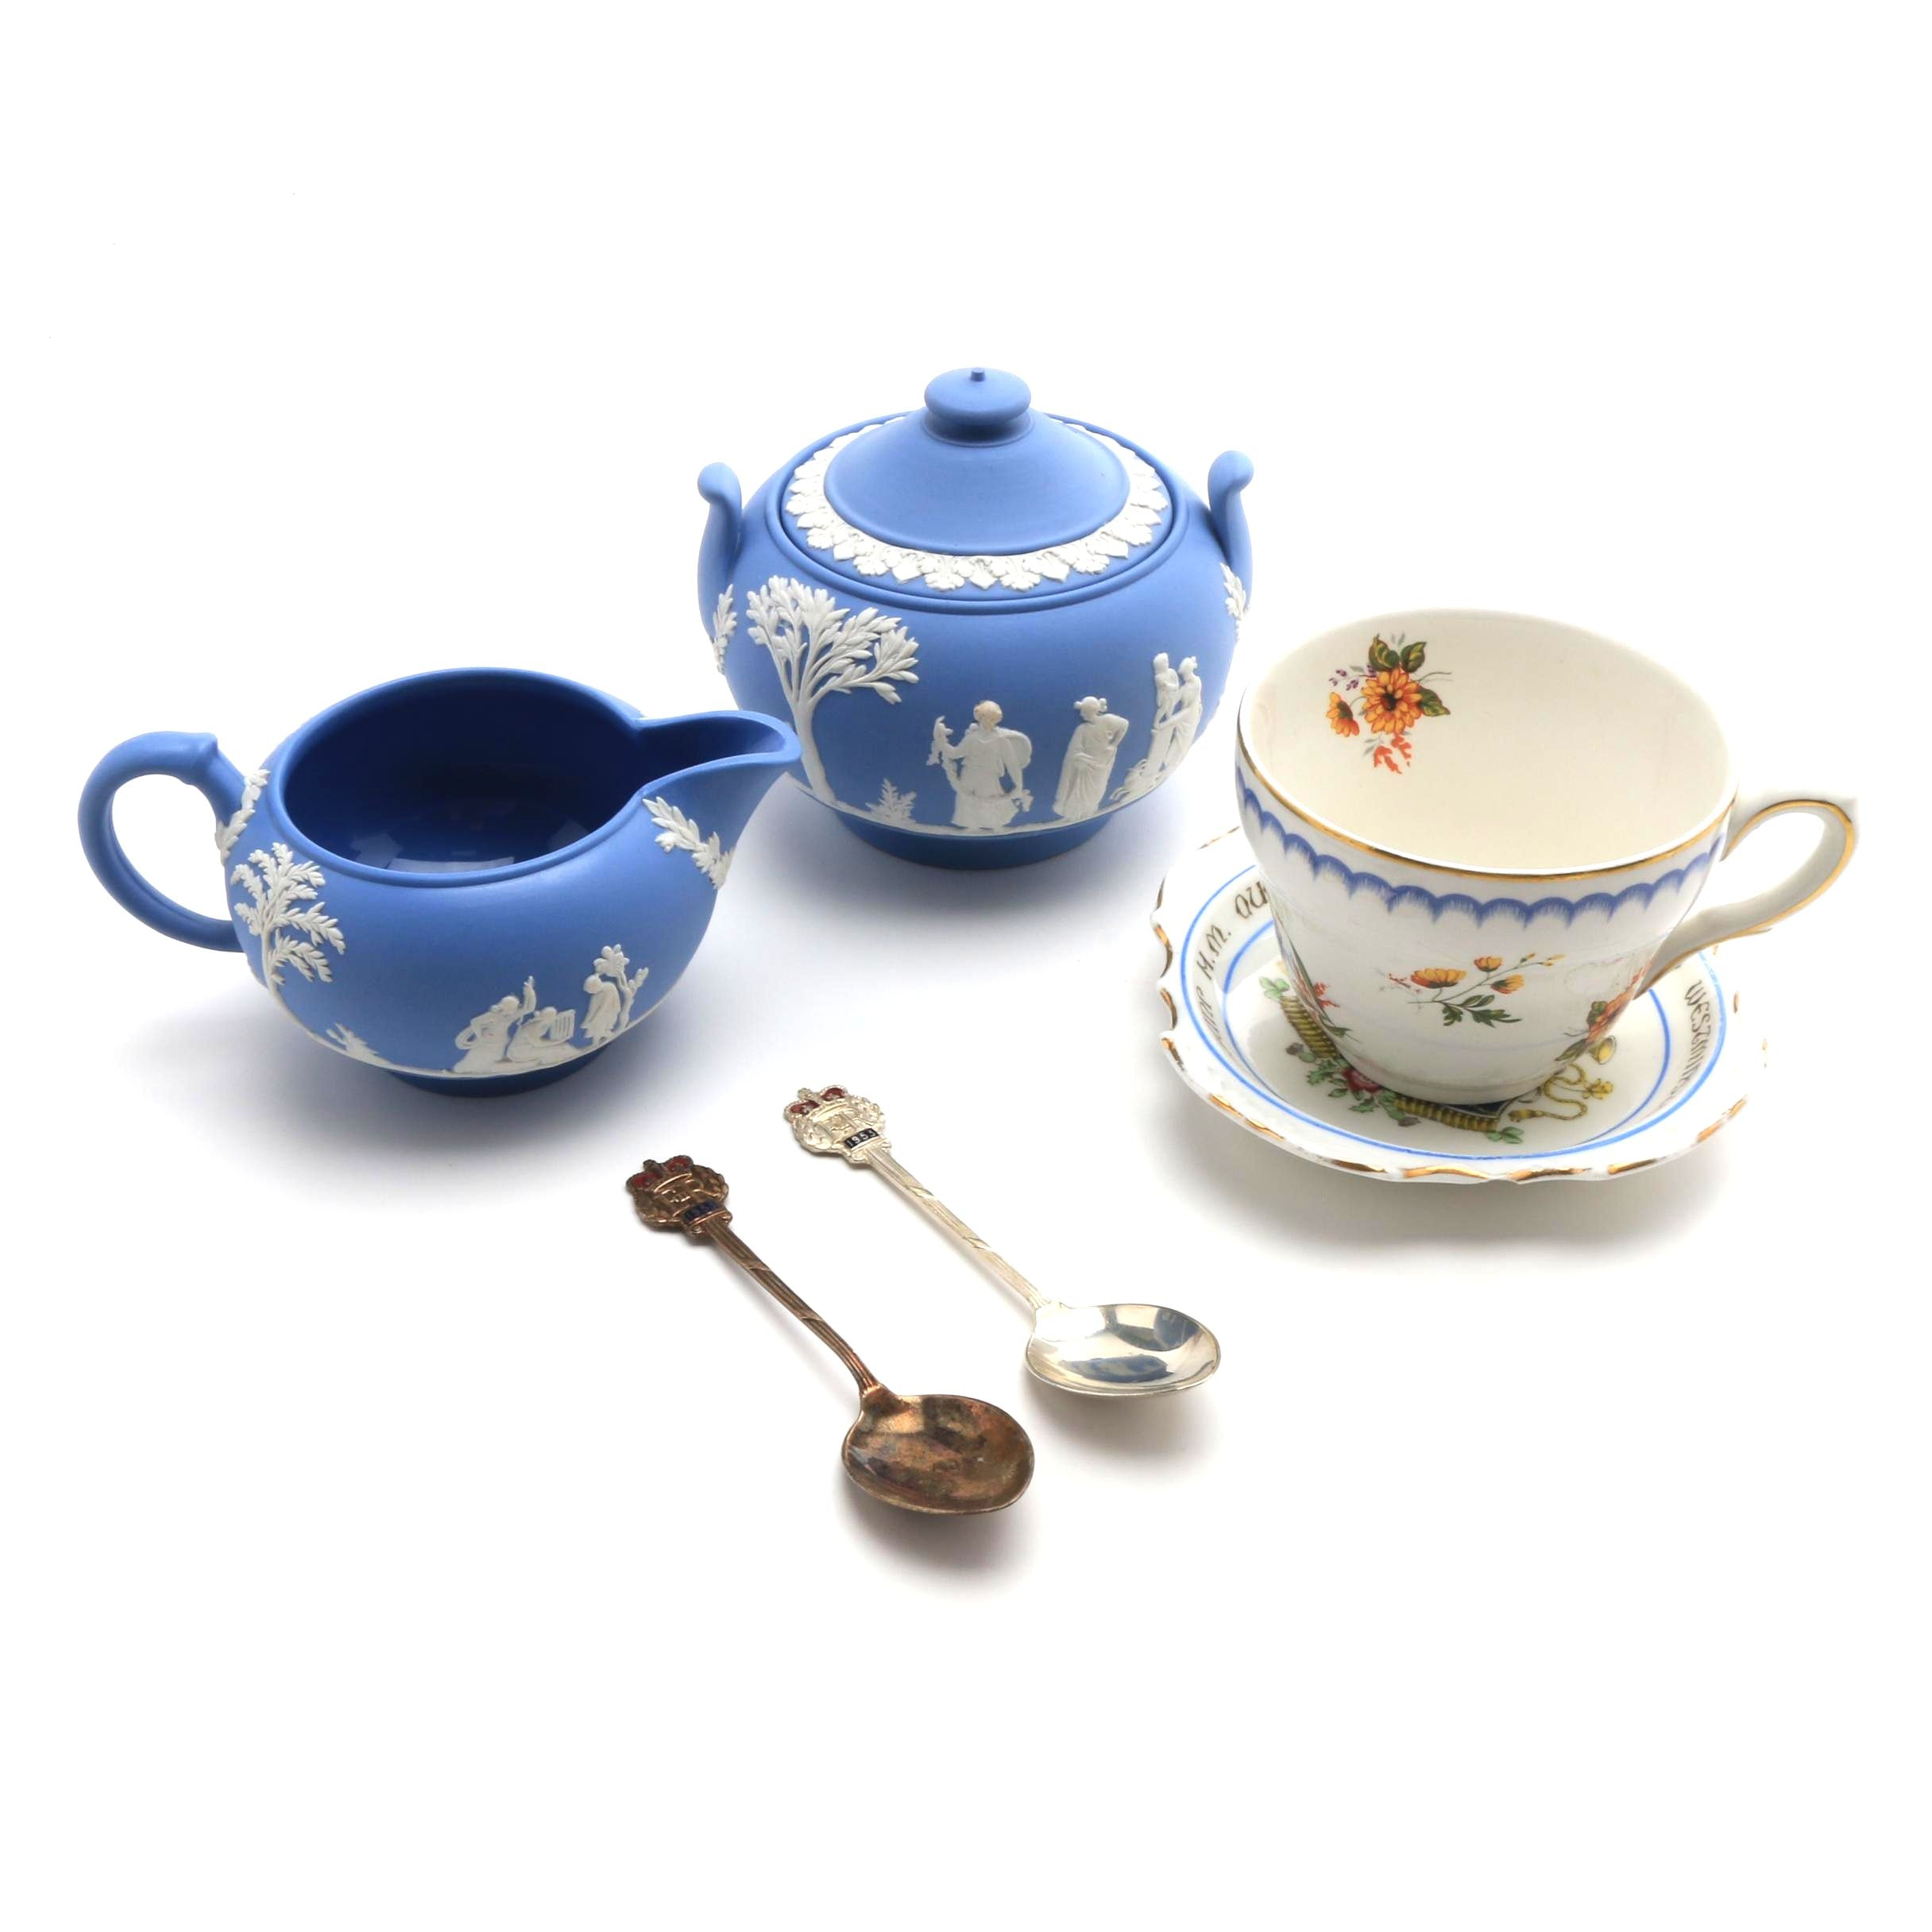 1953 Commemorative Queen Elizabeth II Coronation Dish, Spoons and More